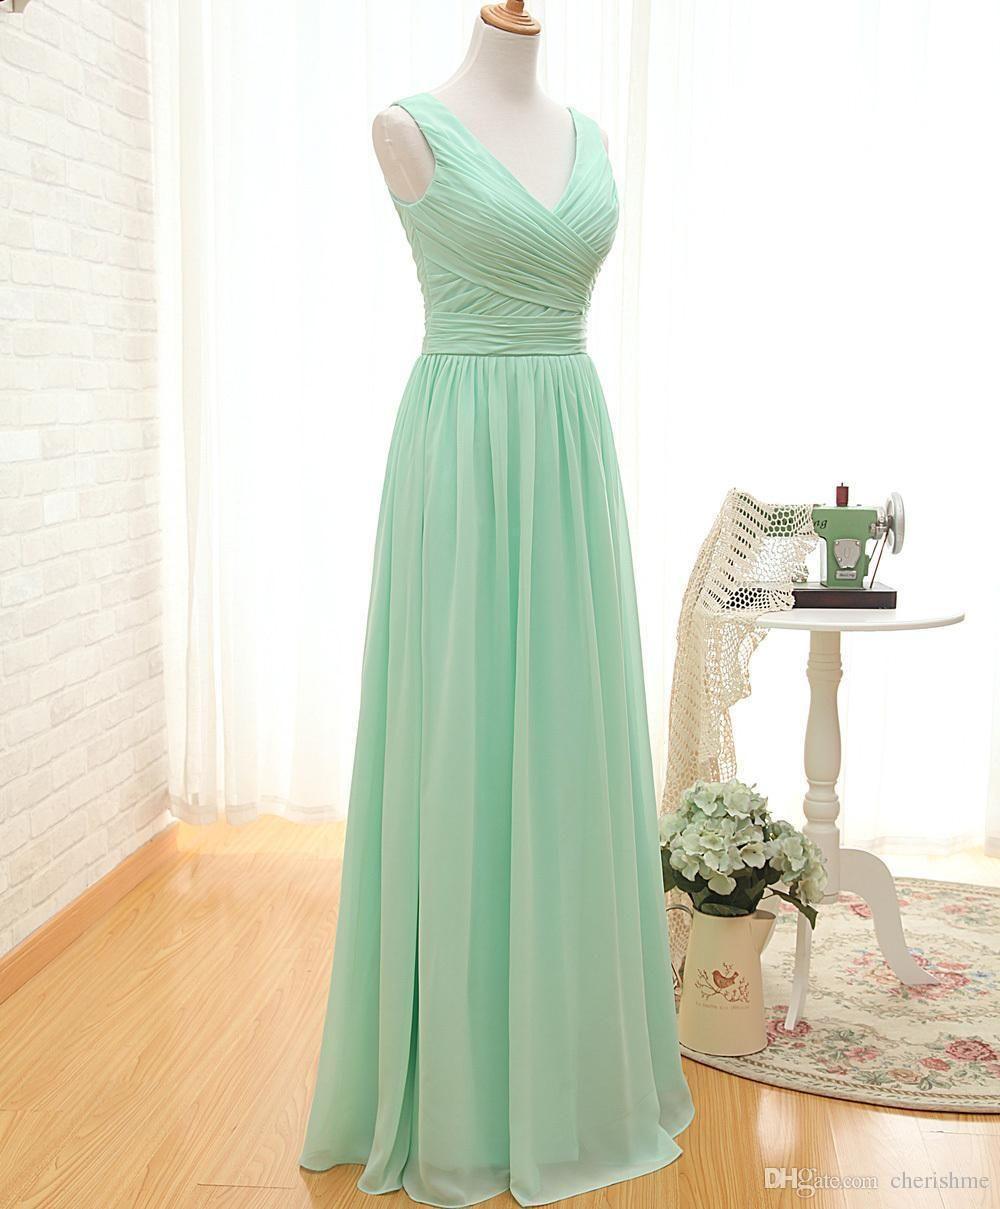 Alluring Mint Green Bridesmaid Dresses Long Chiffon A Line Floor Length V Neck And Mint Green Bridesmaid Dresses Mint Green Prom Dress Green Bridesmaid Dresses [ 1209 x 1000 Pixel ]